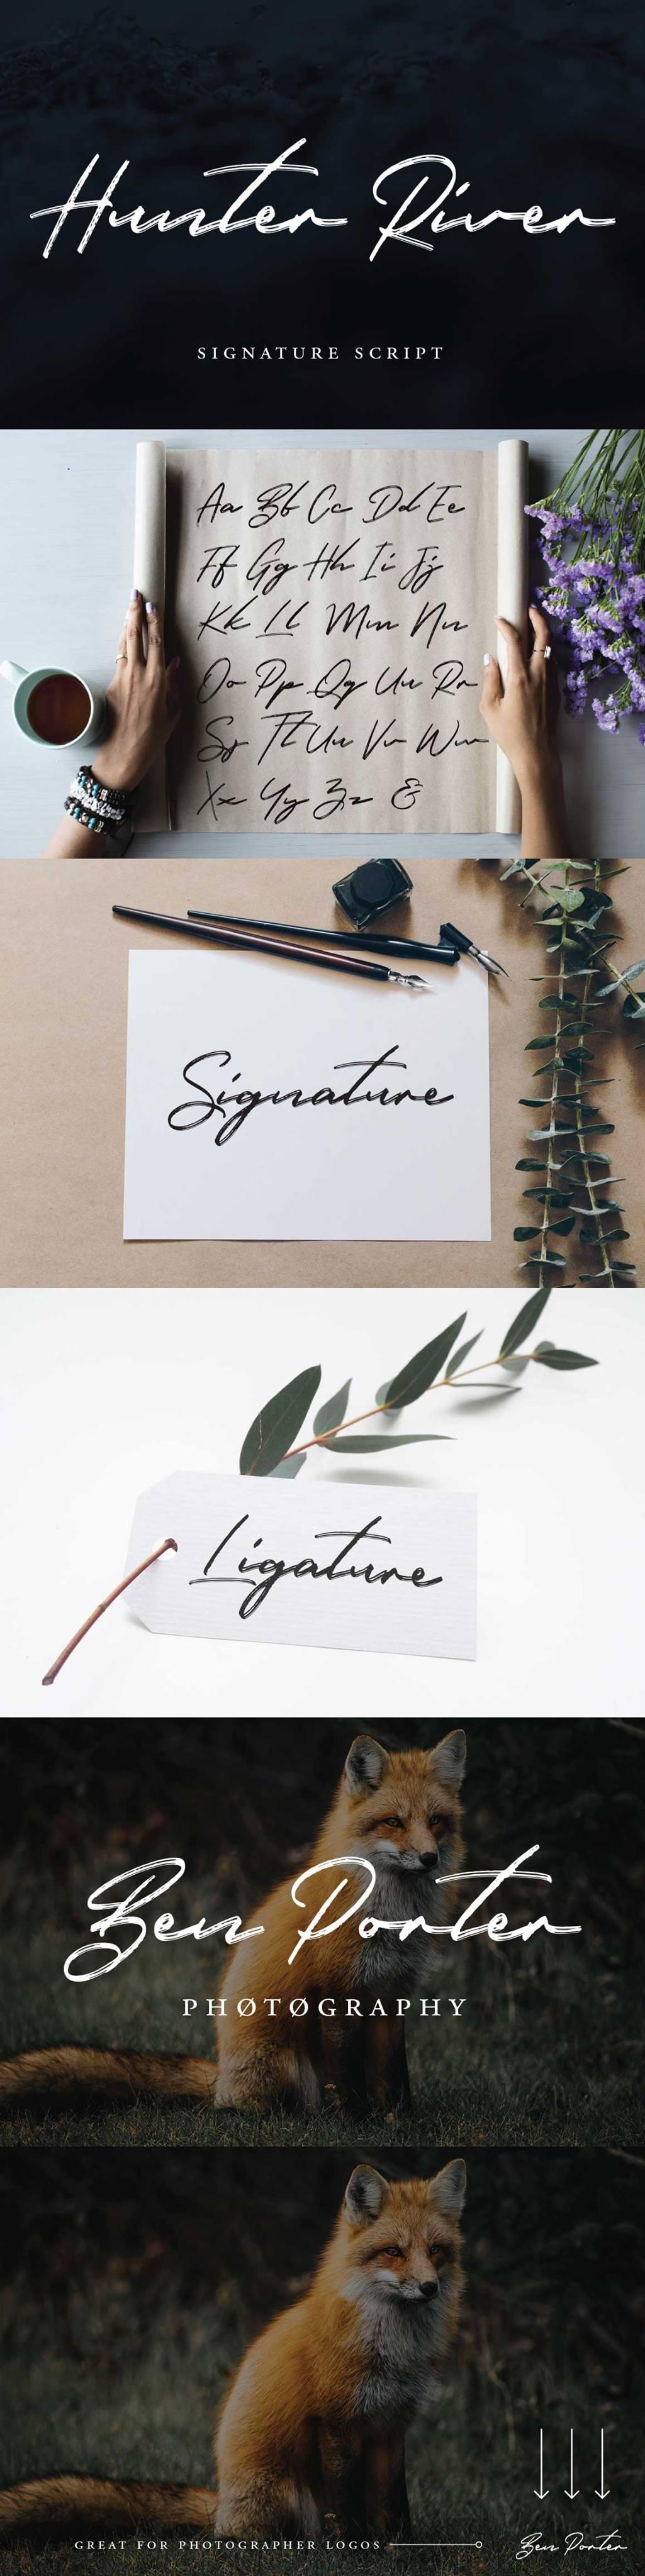 Hunter+River+-+Free+Signature+Font